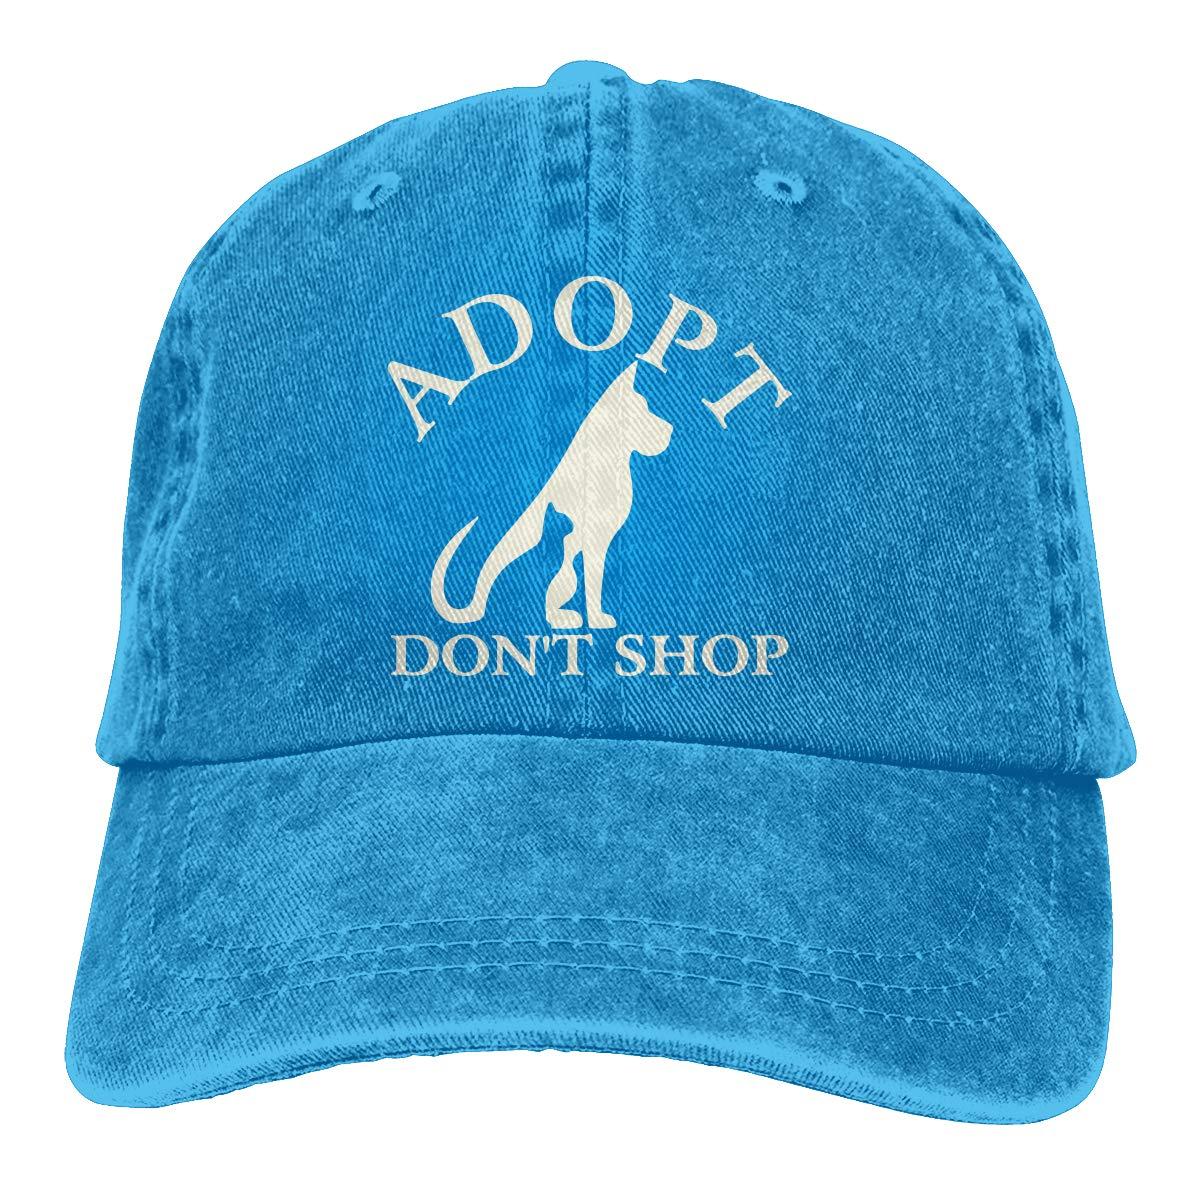 PMGM-C Adopt Dont Shop Unisex Personalize Cowboy Hip Hop Cap Adjustable Baseball Cap